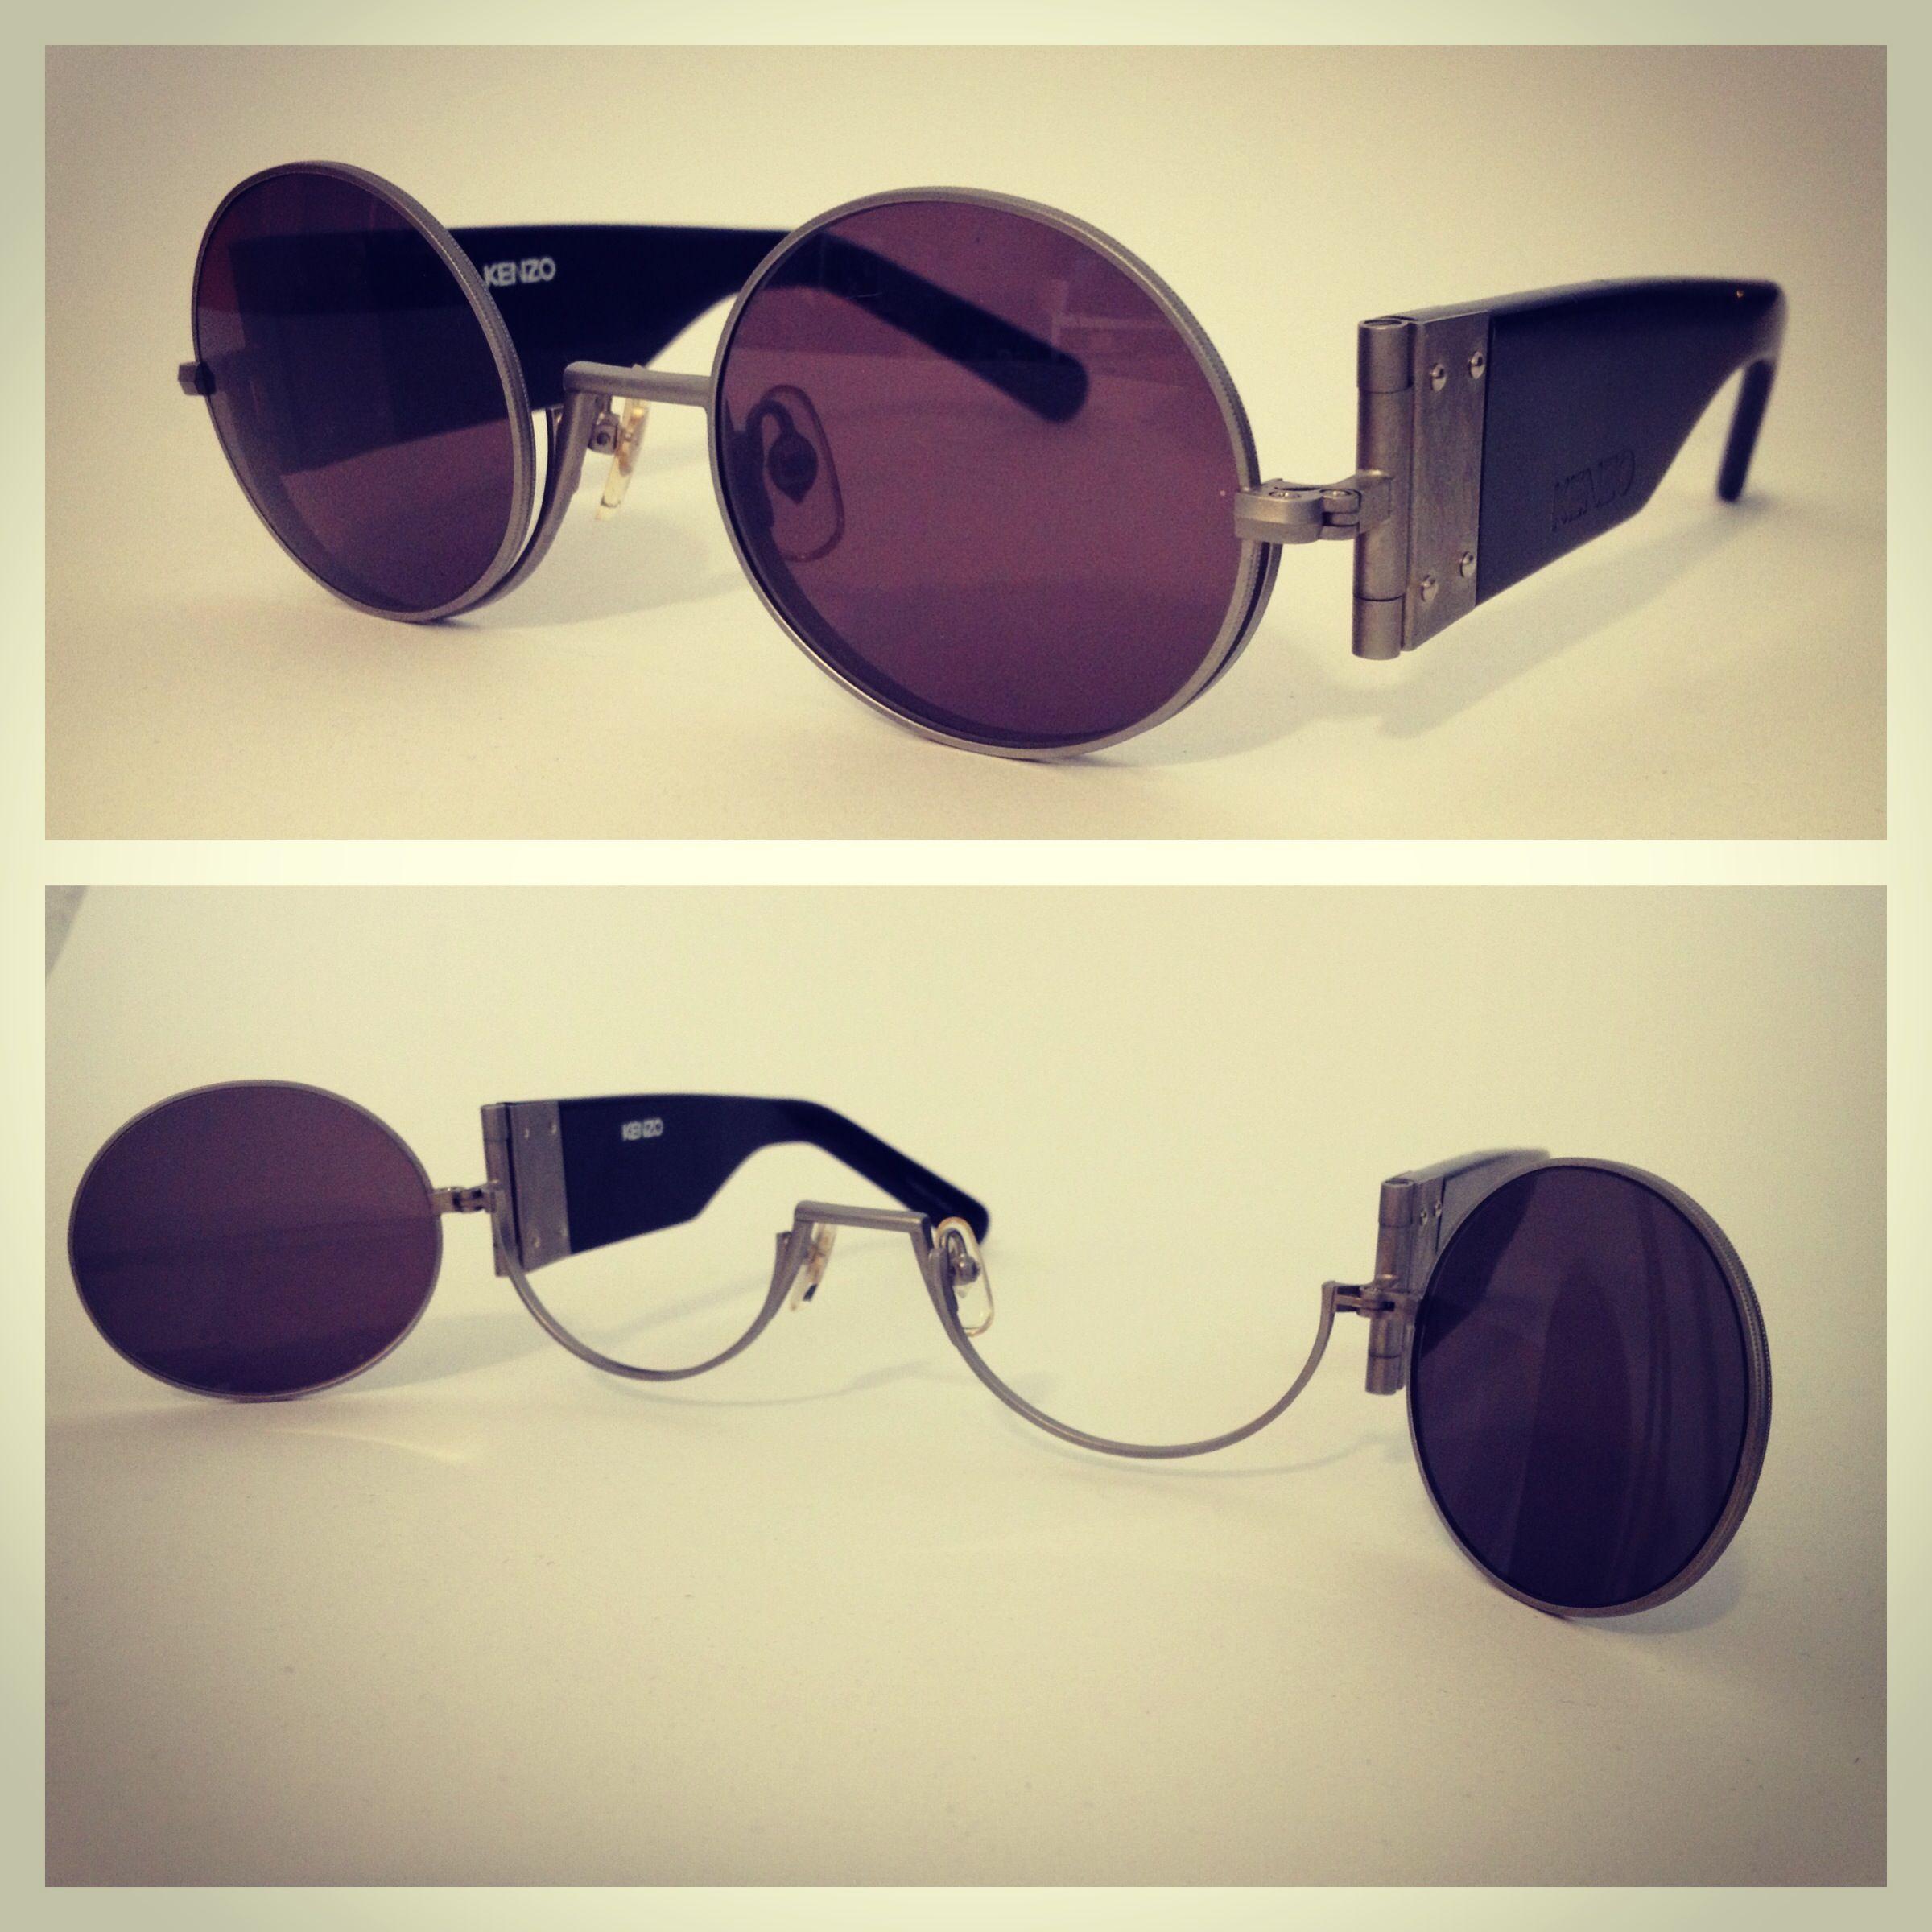 vintage kenzo sunglasses vintage sunglasses collection